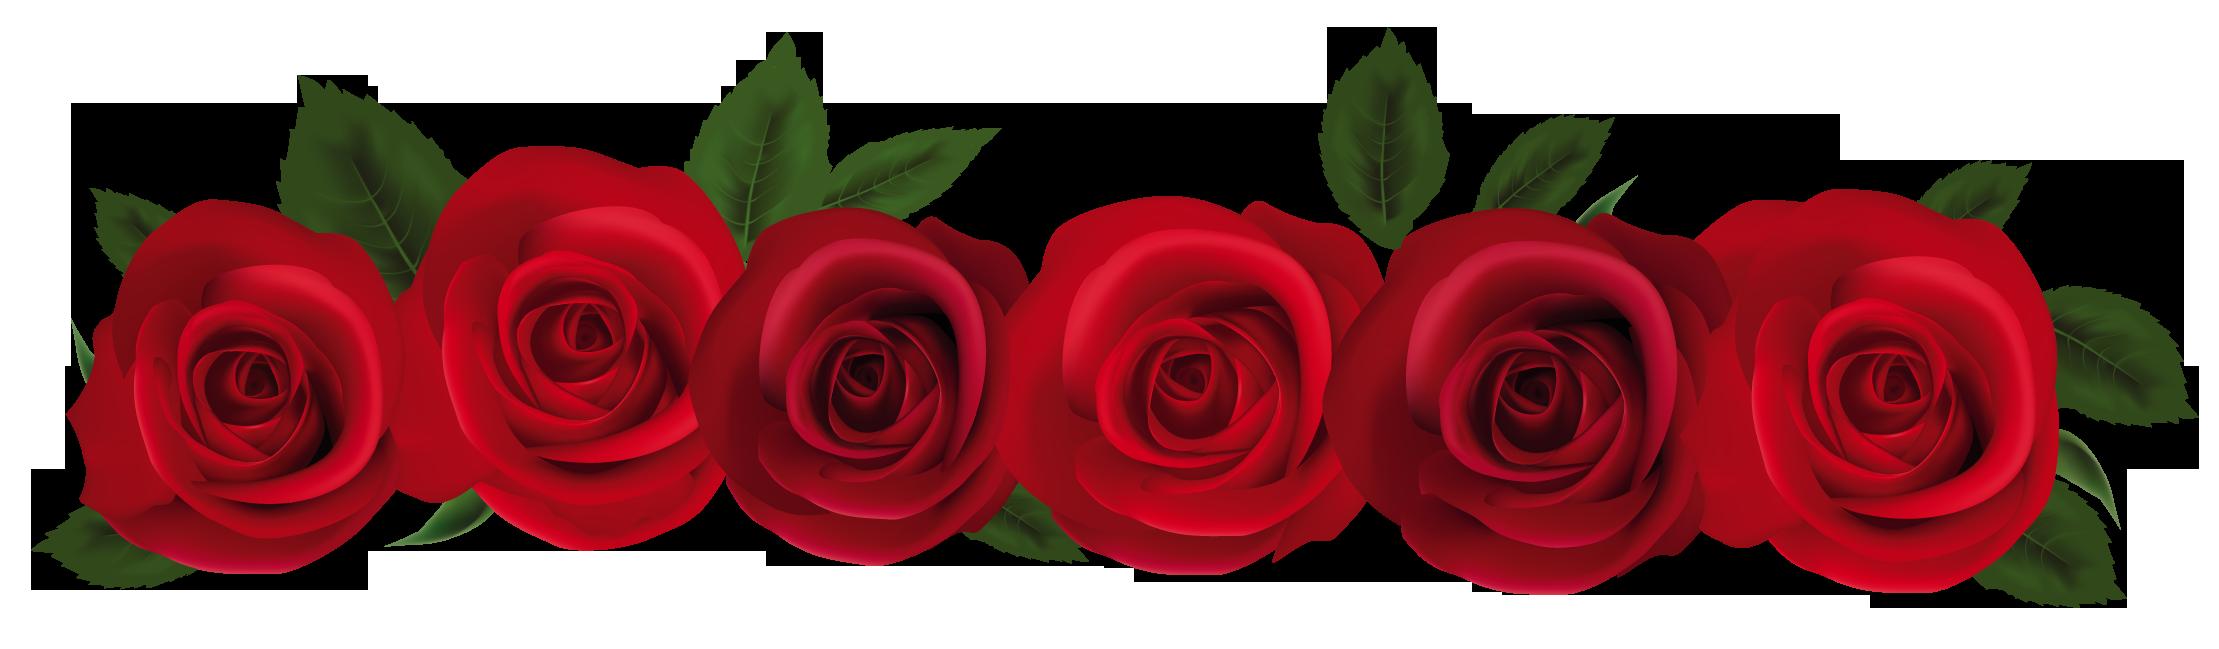 rose clip art border